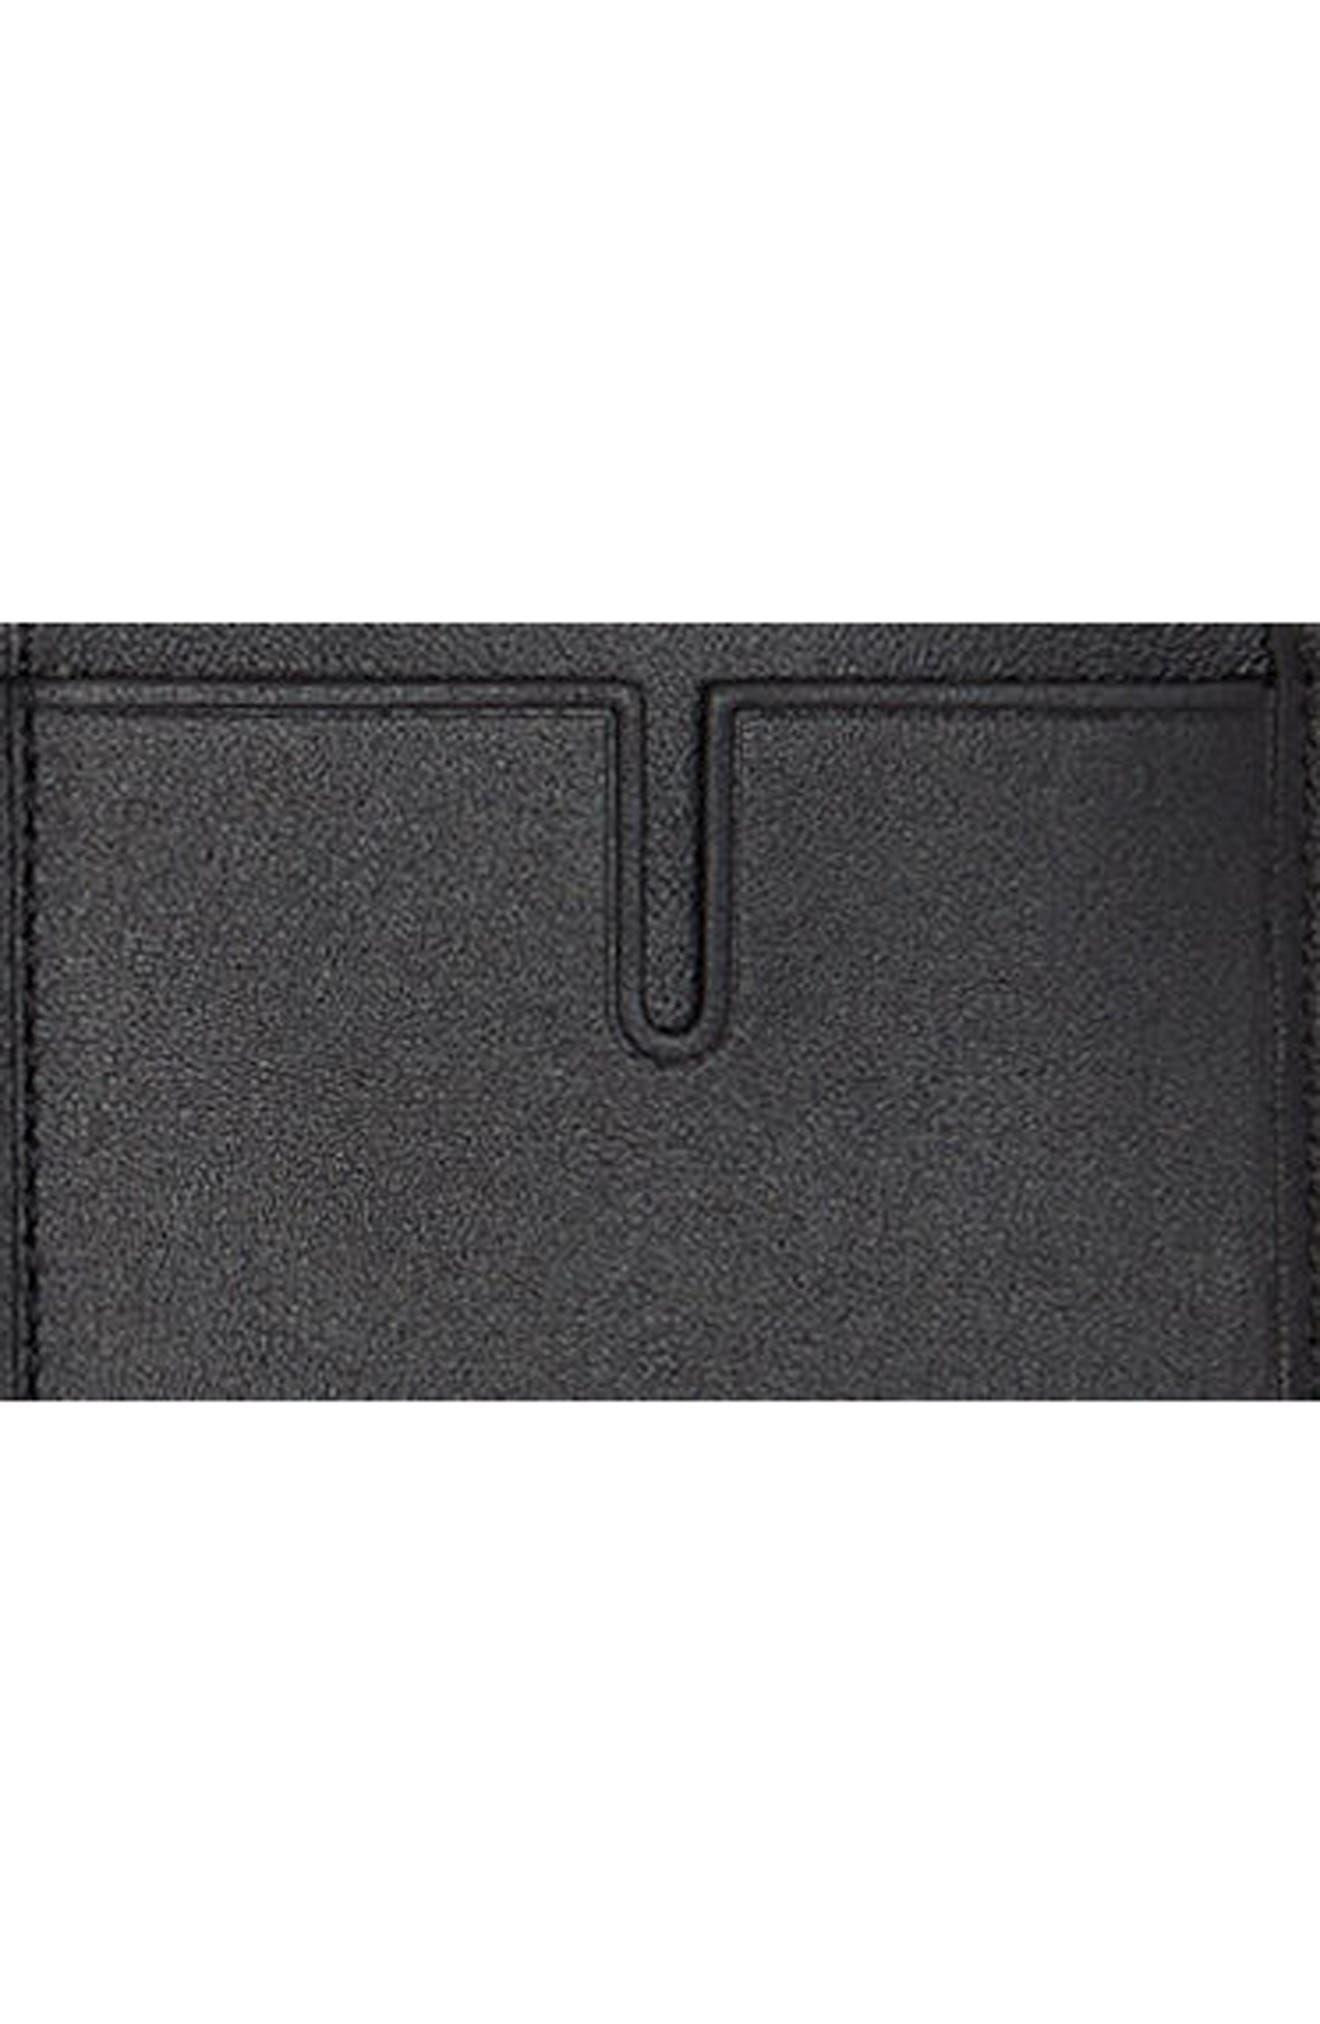 Alpha Folding Card Case,                             Alternate thumbnail 3, color,                             Anthracite/ Black